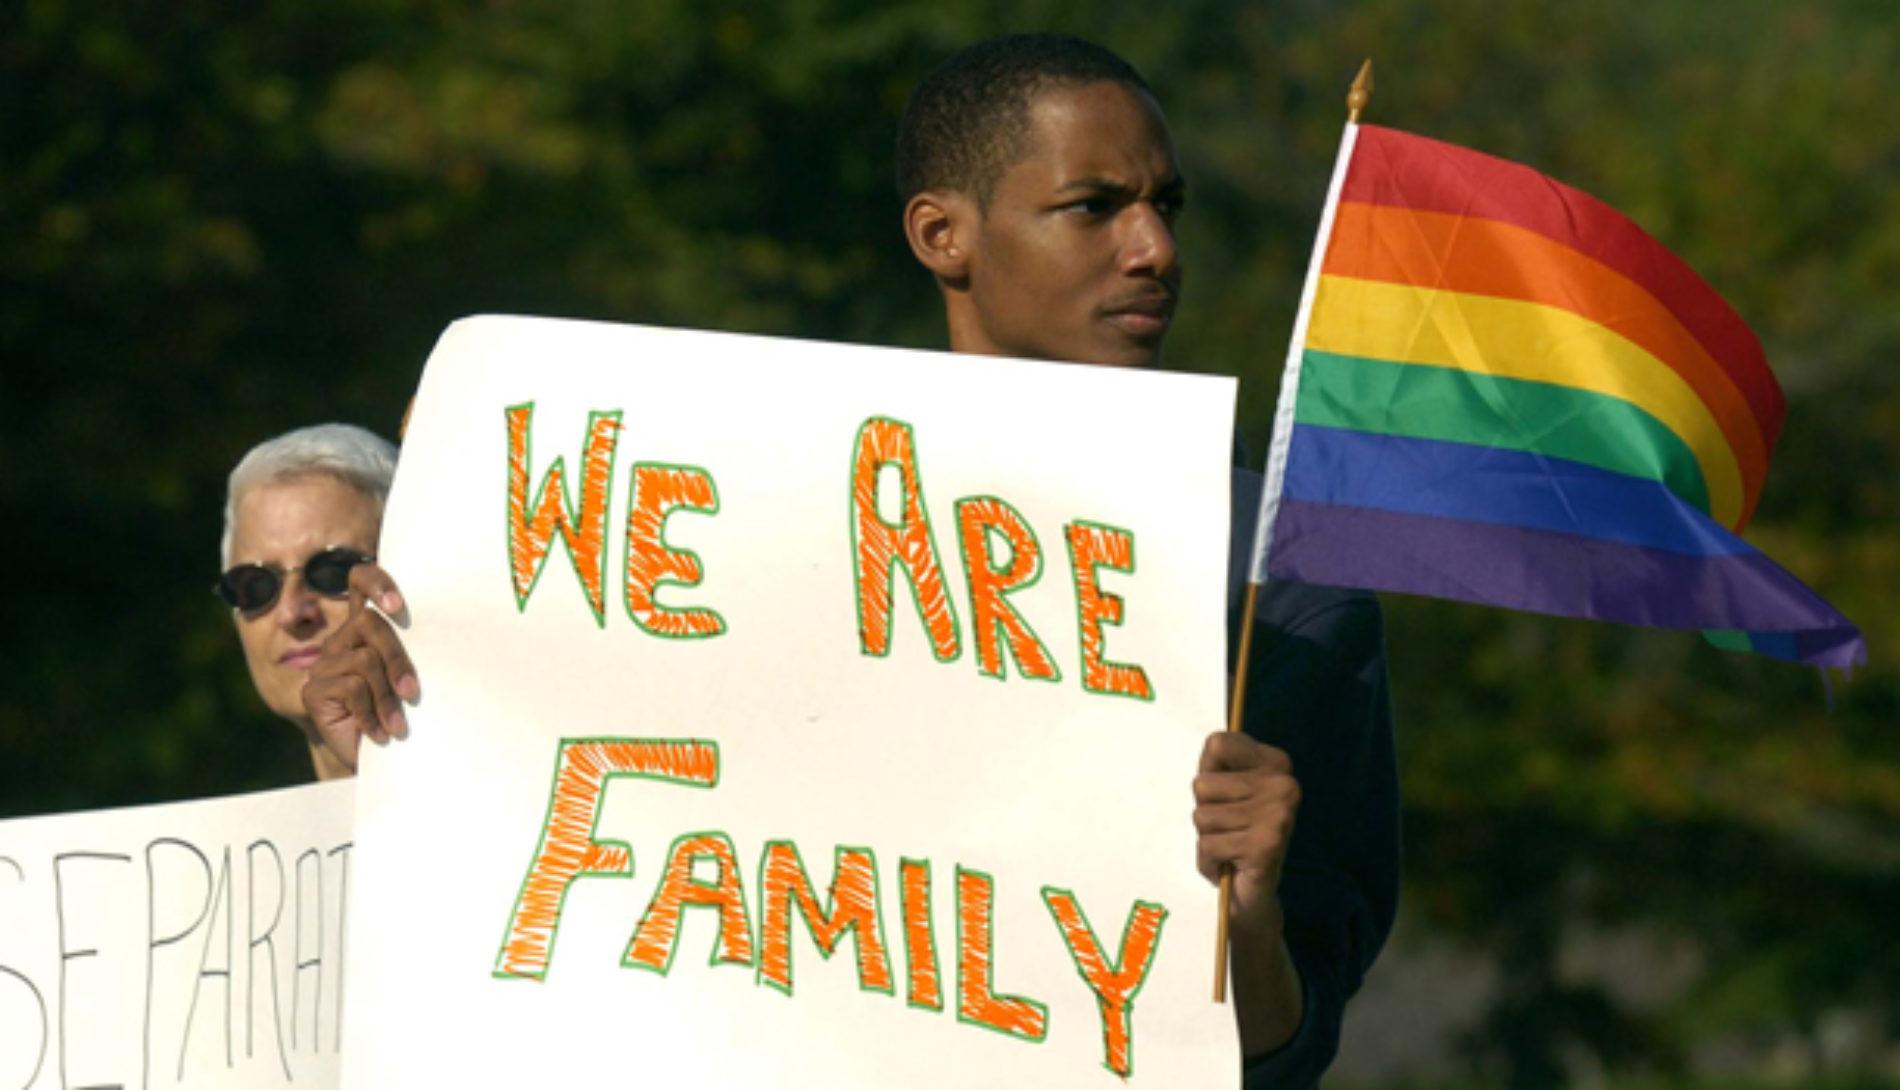 John Pavlovitz: No, Being Gay (Lesbian, Bisexual, or Transgender) is Not a Sin